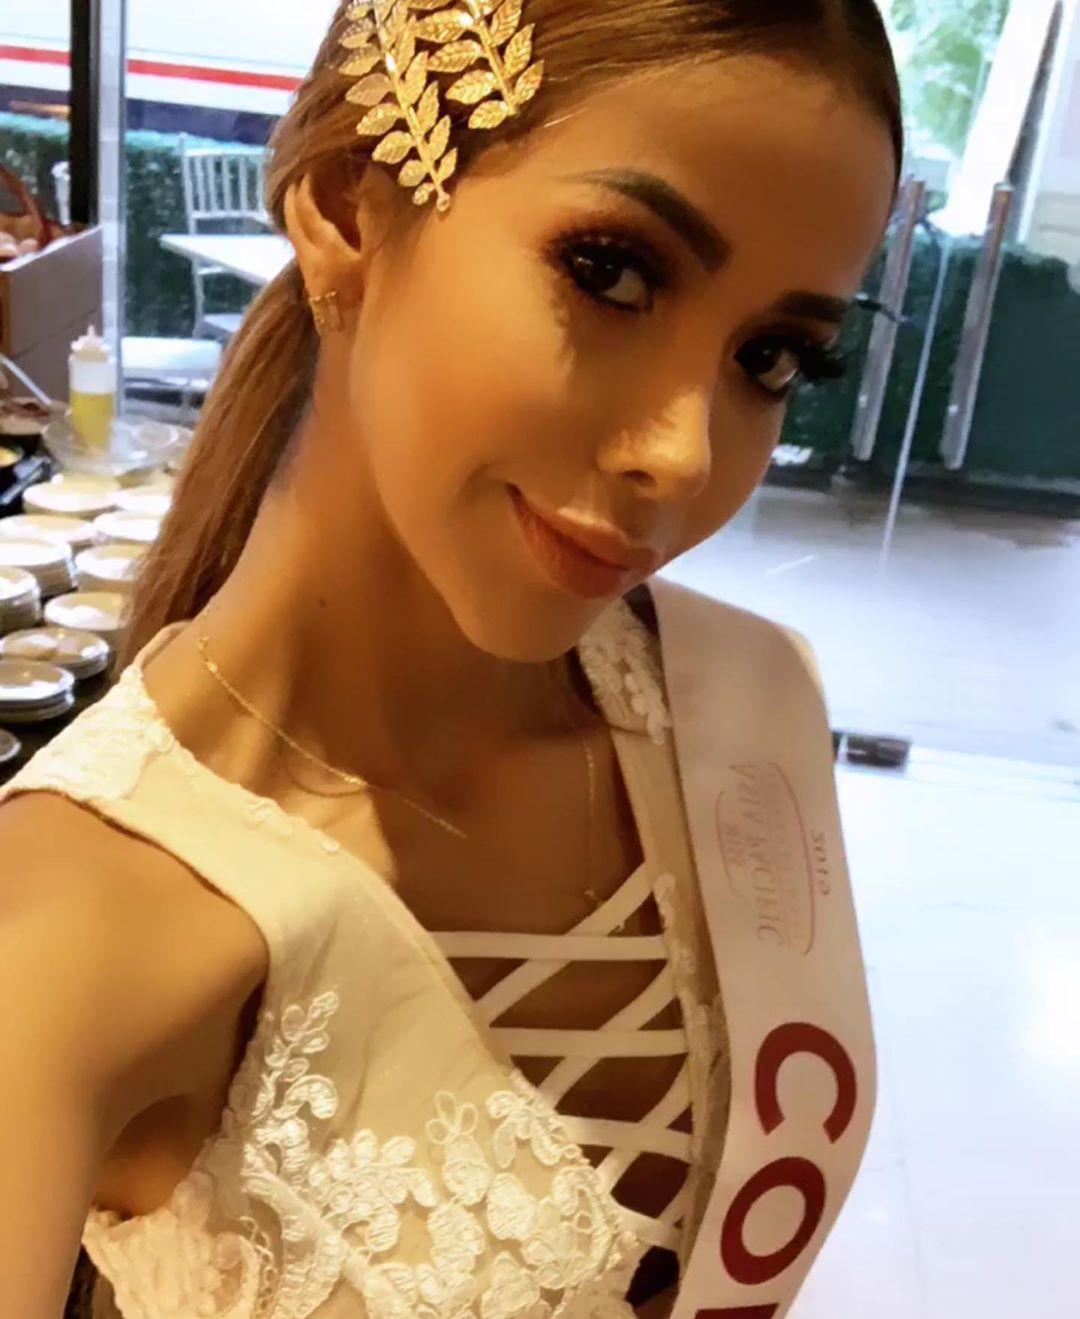 alejandra rodriguez osorio, miss asia pacific colombia 2019. - Página 2 70461610